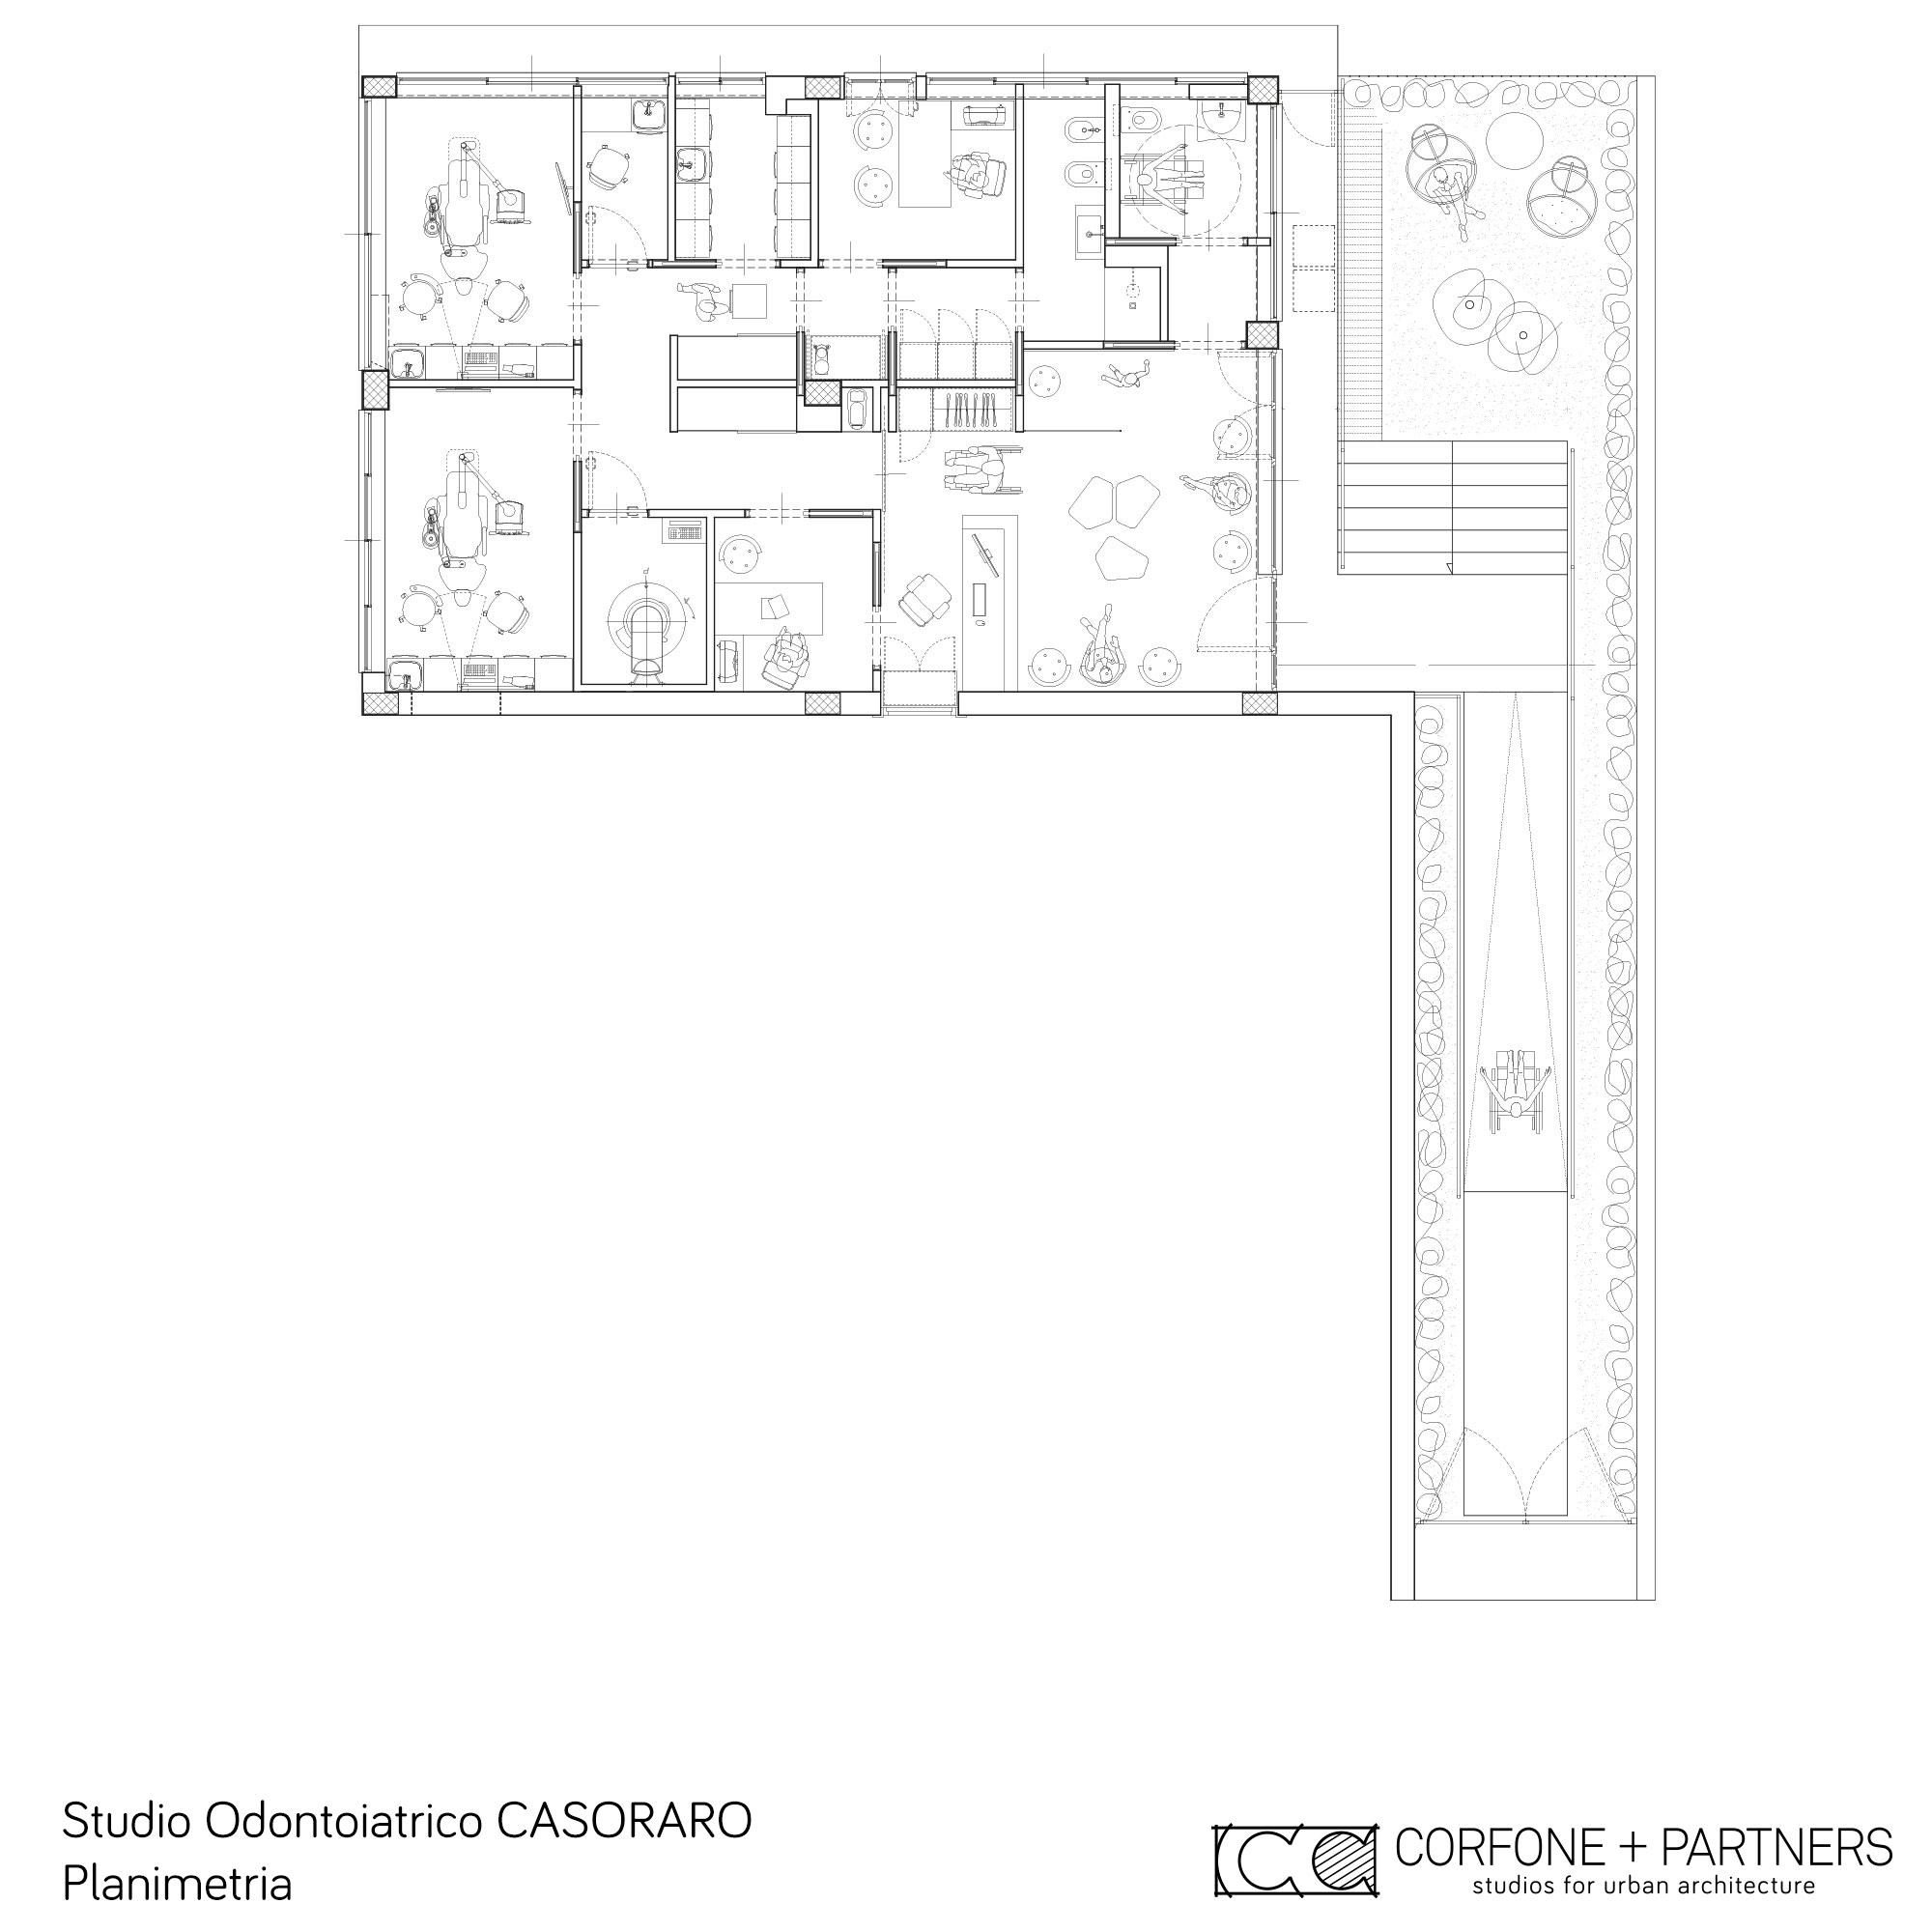 Progetto-Studio-Odontoiatrico-CASORARO-Pescara - 01